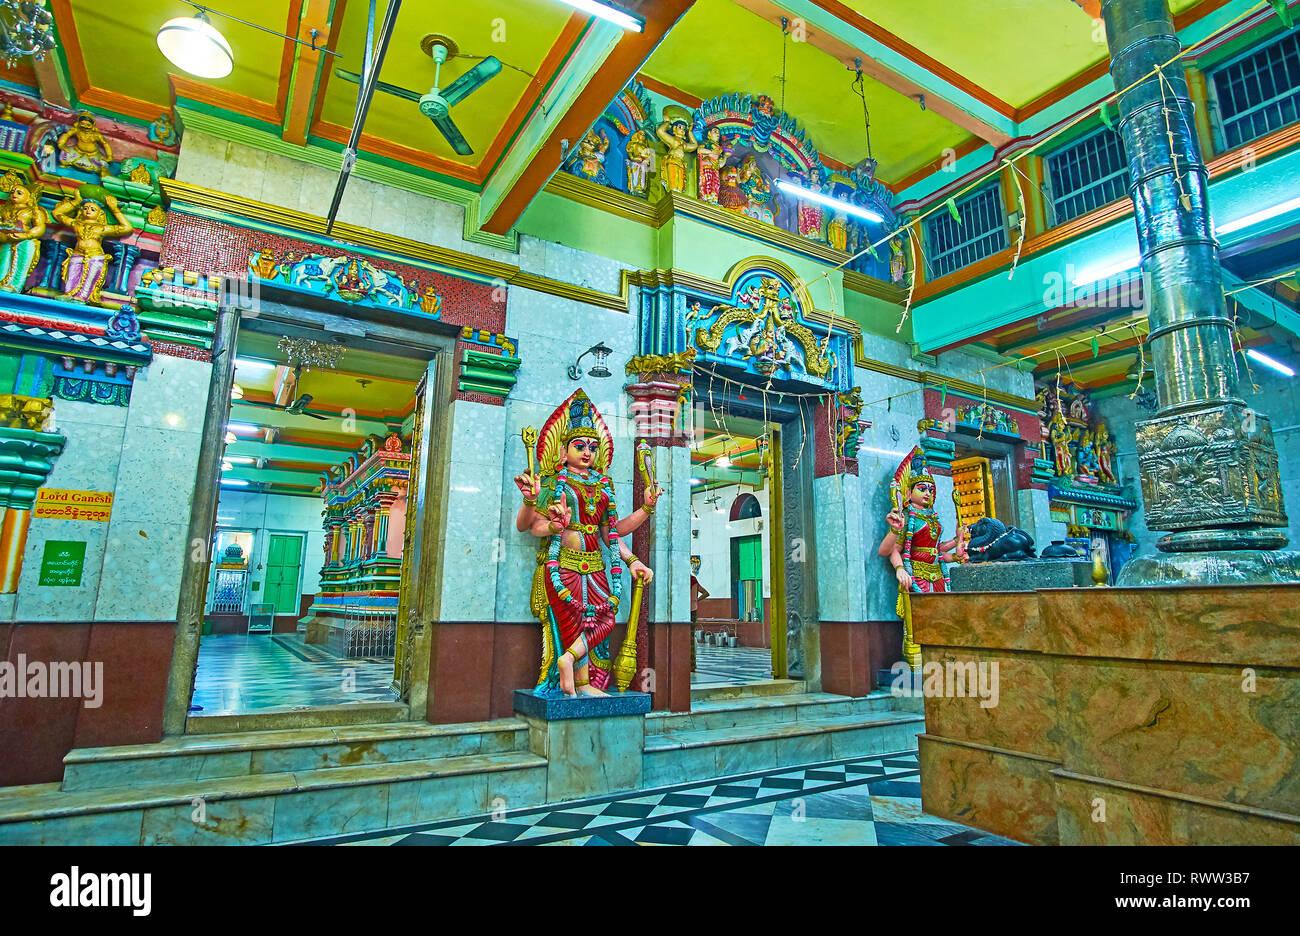 YANGON, MYANMAR - FEBRUARY 15, 2018: Interior of Mandapa hall of Sri Kaali Amman Hindu Temple, decorated with colorful statues of Hindu deities, on Fe - Stock Image